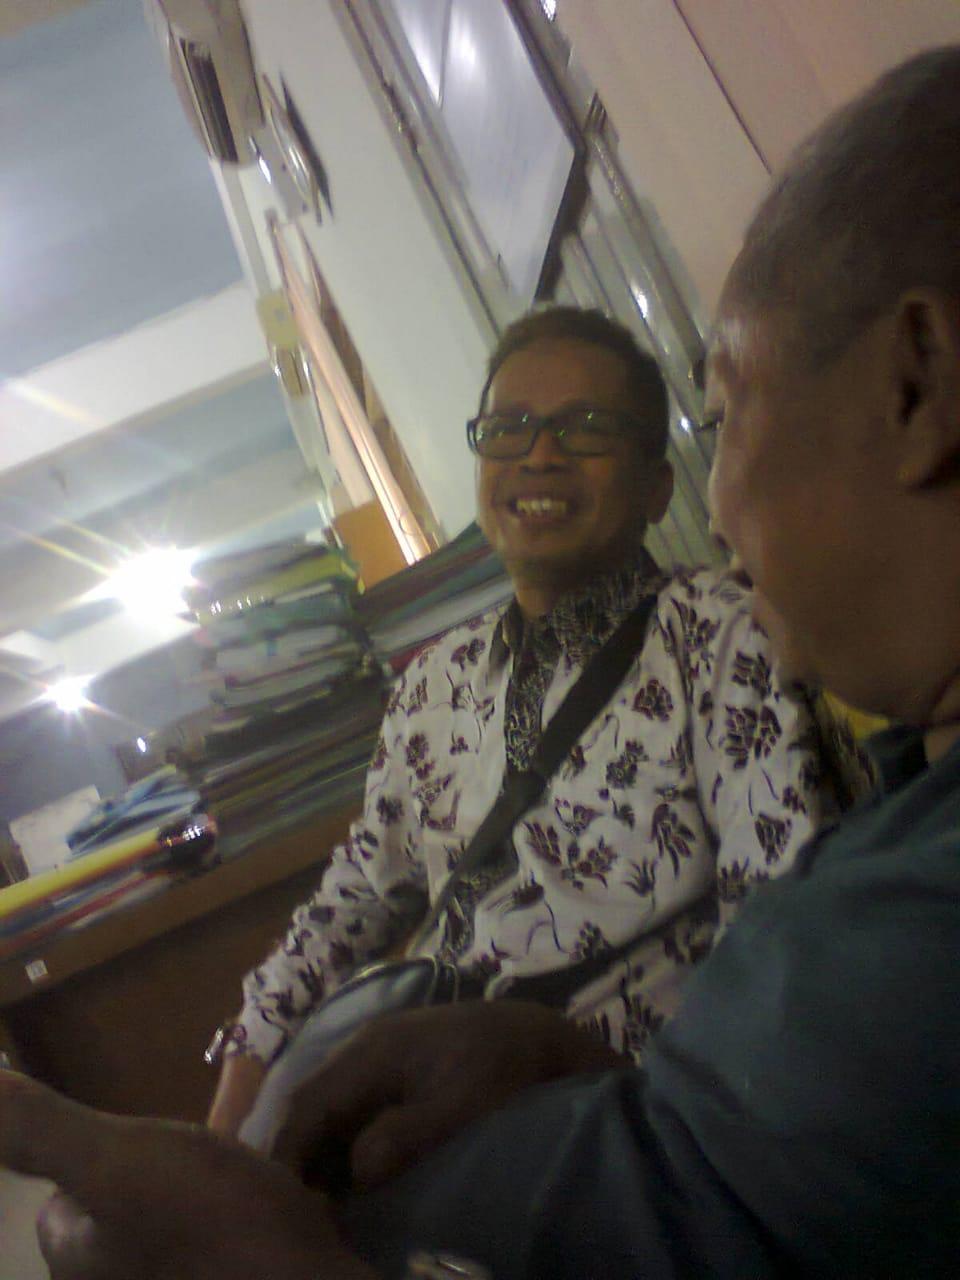 Penggunaan Dana BOS Sudah Ditangani Inspektorat, Kasek SDN Sumengko Terancam Sanksi